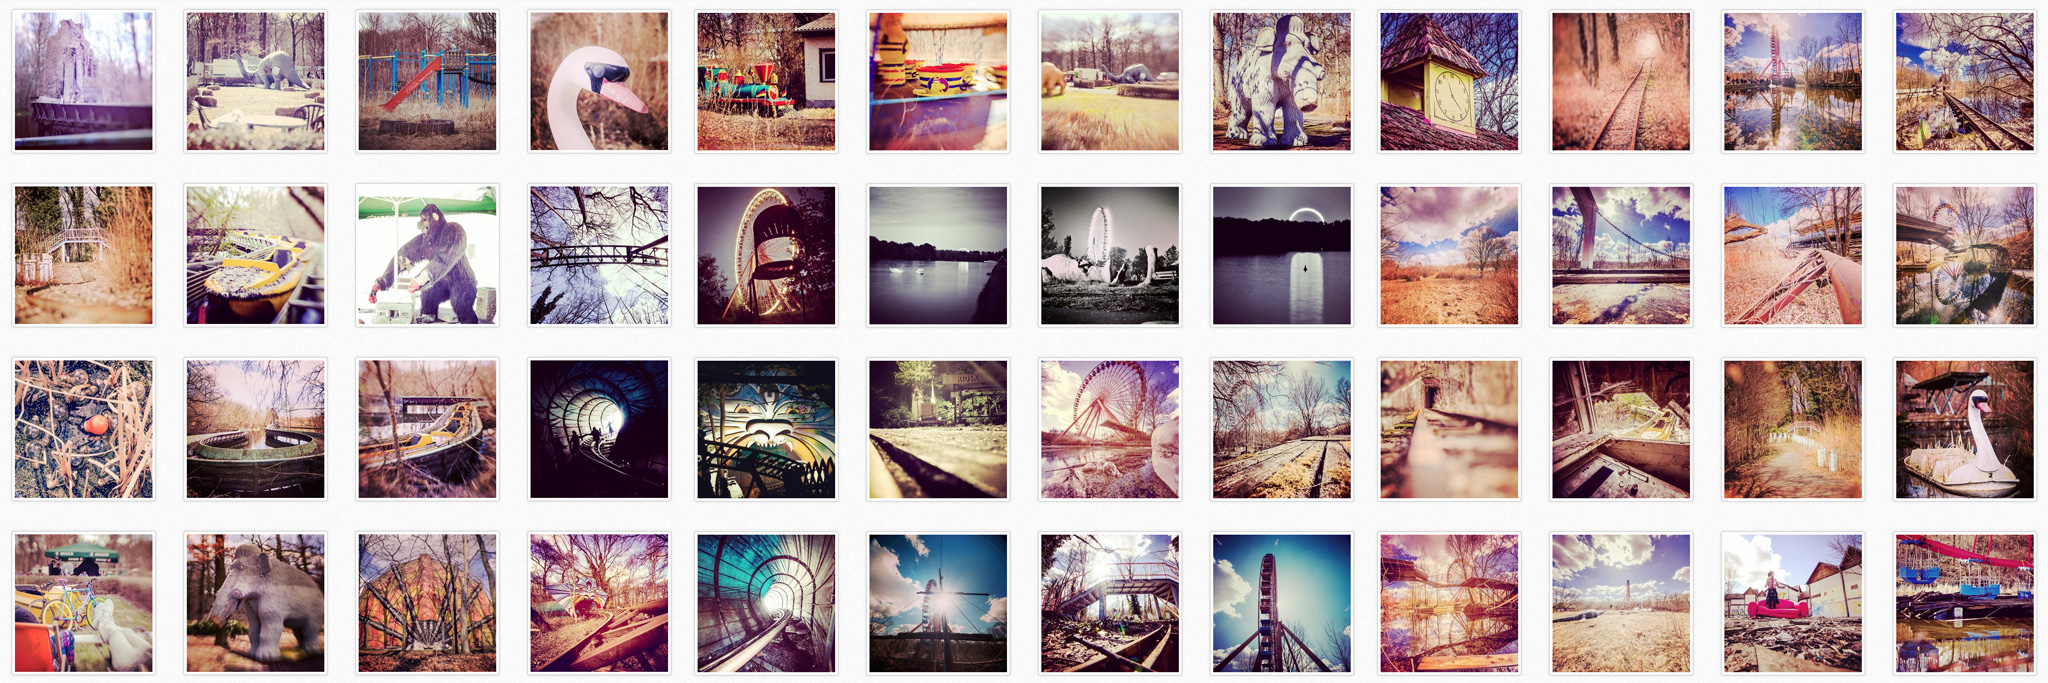 Spreepark Plänterwald Berlin Instagram lostplace